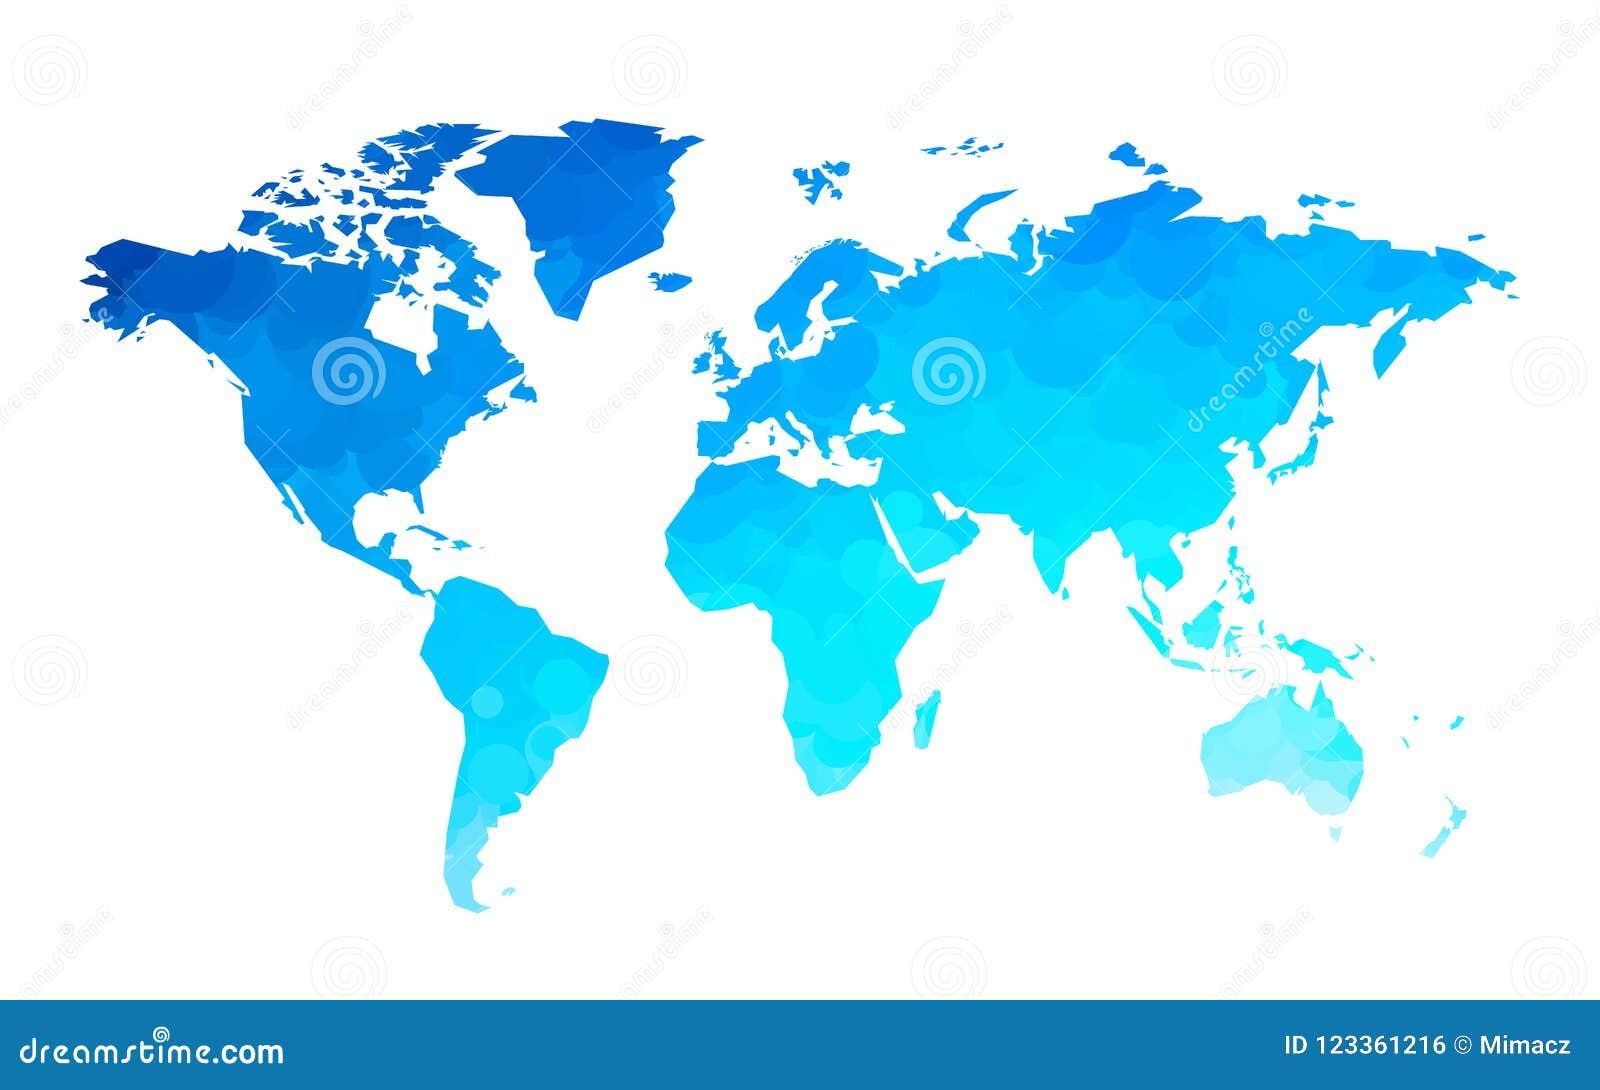 Blue circles world map background